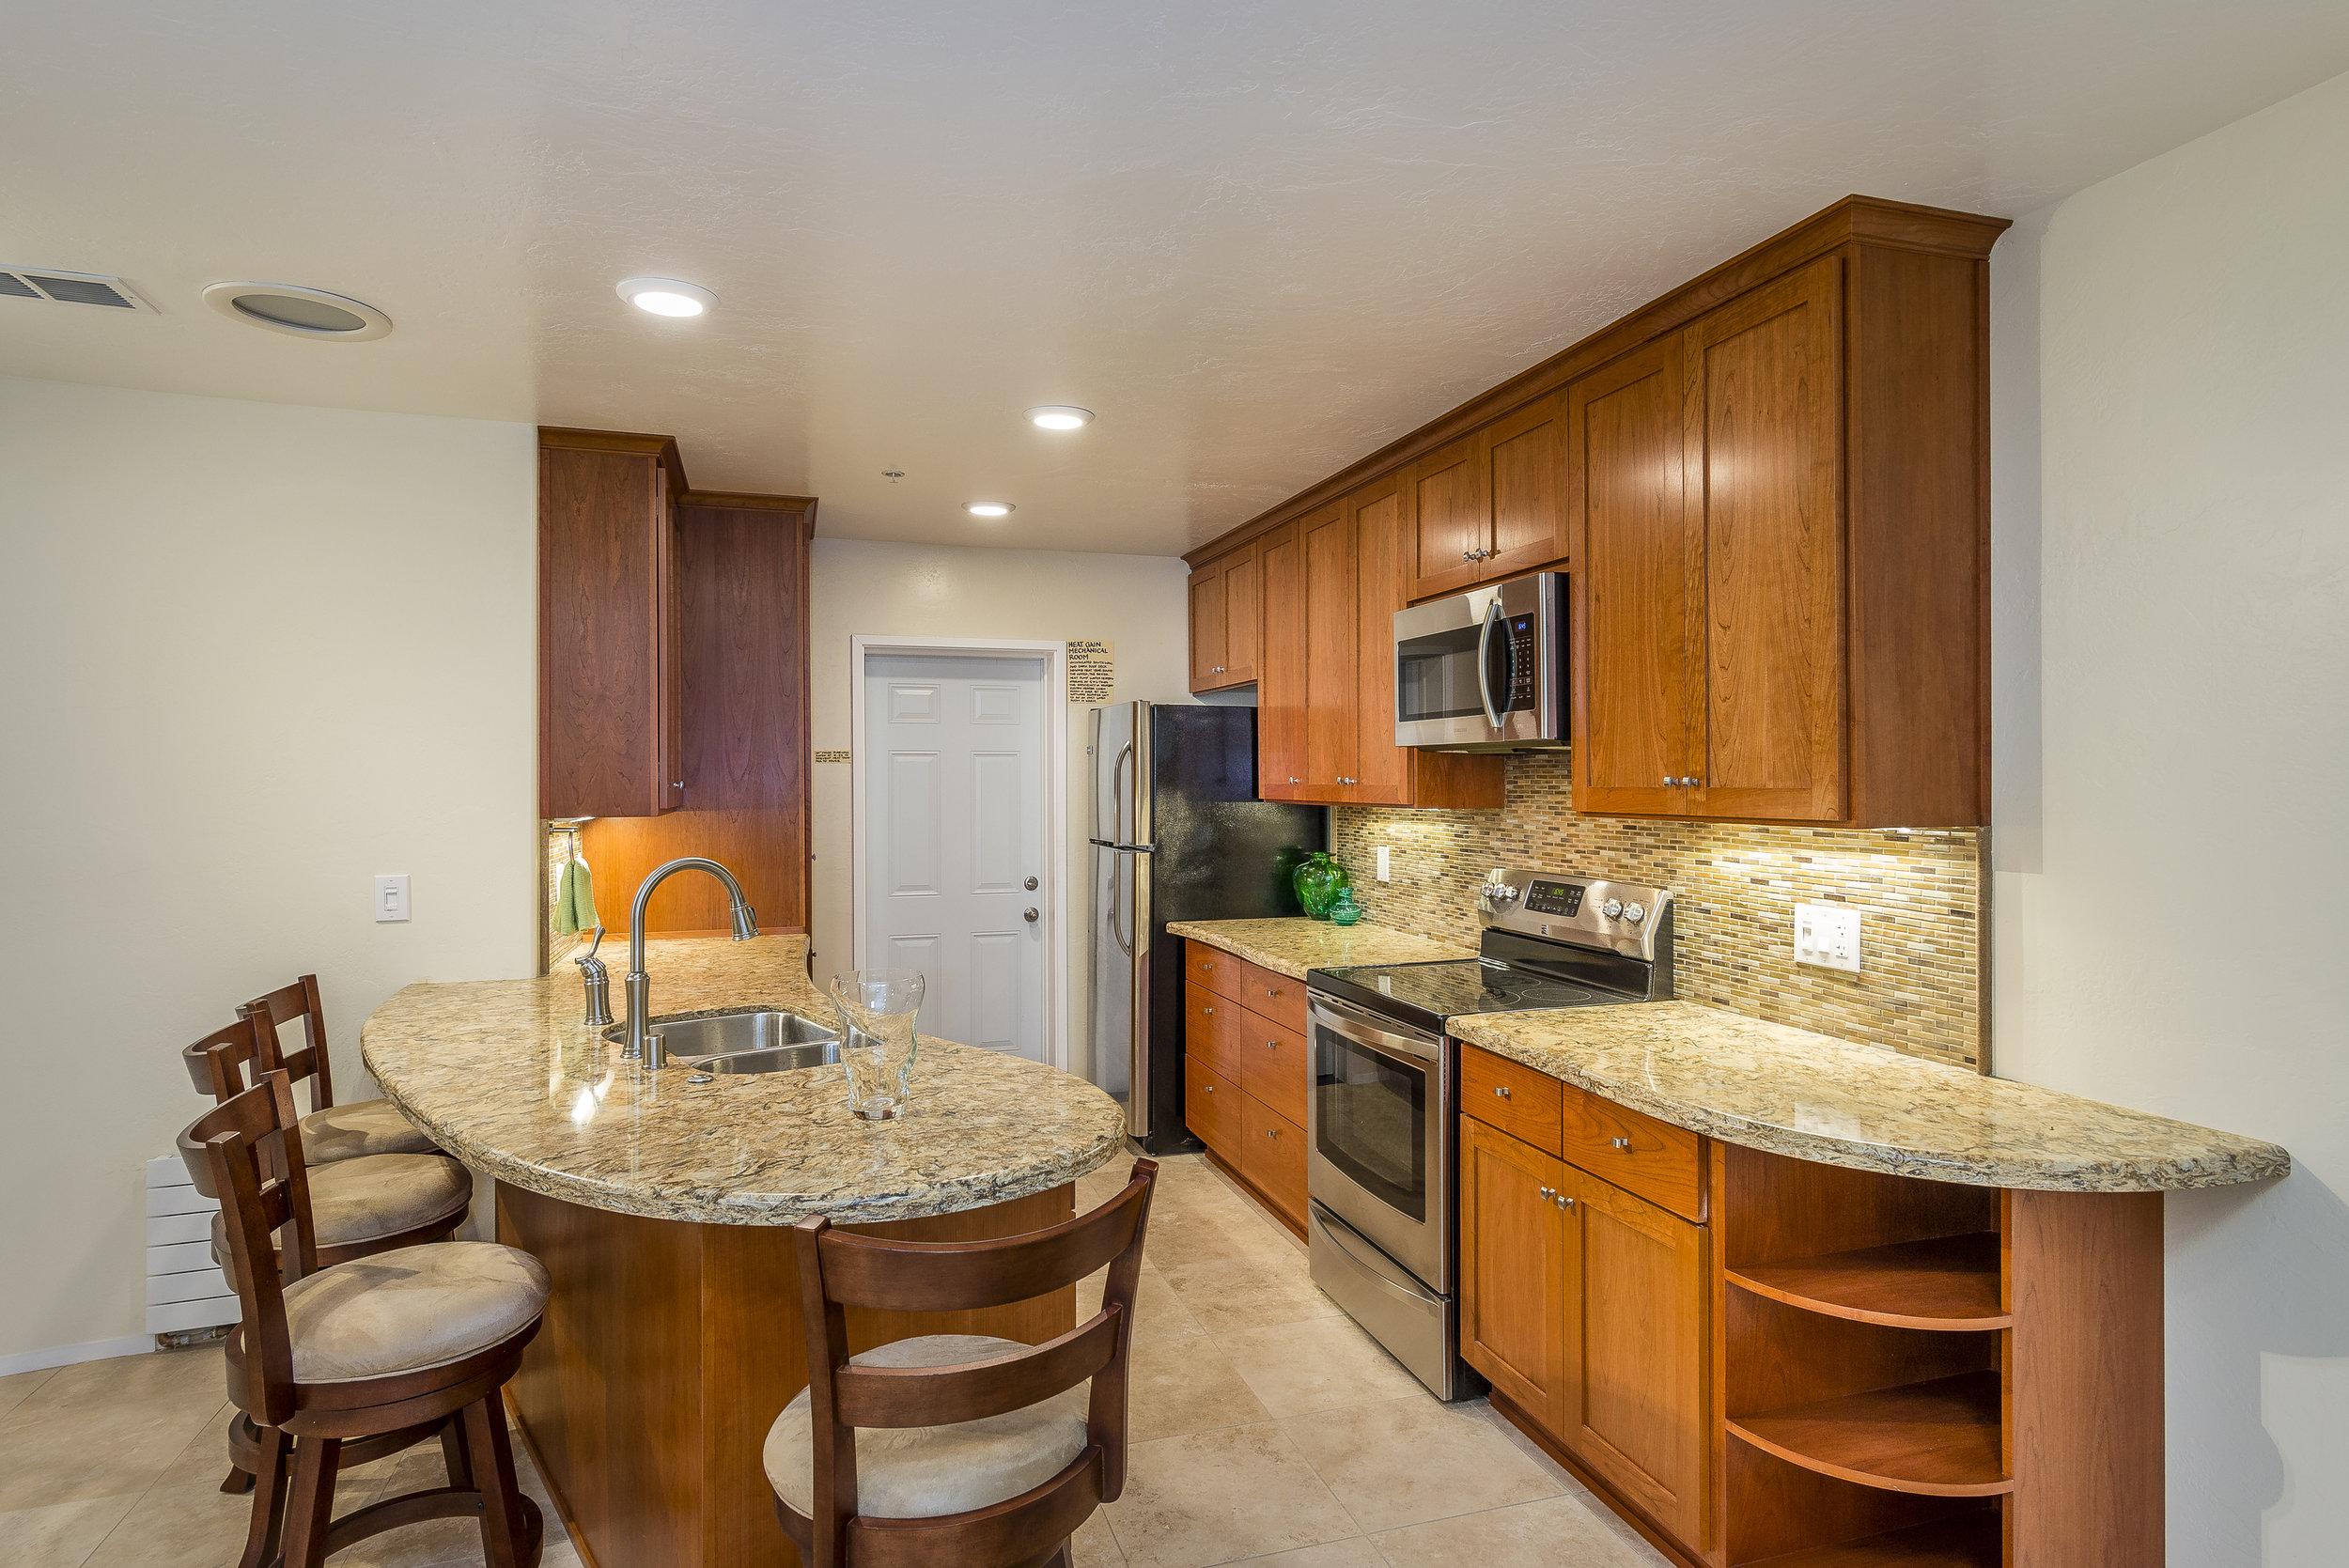 0014_Kitchen_Zero Energy Home HI RES.jpg